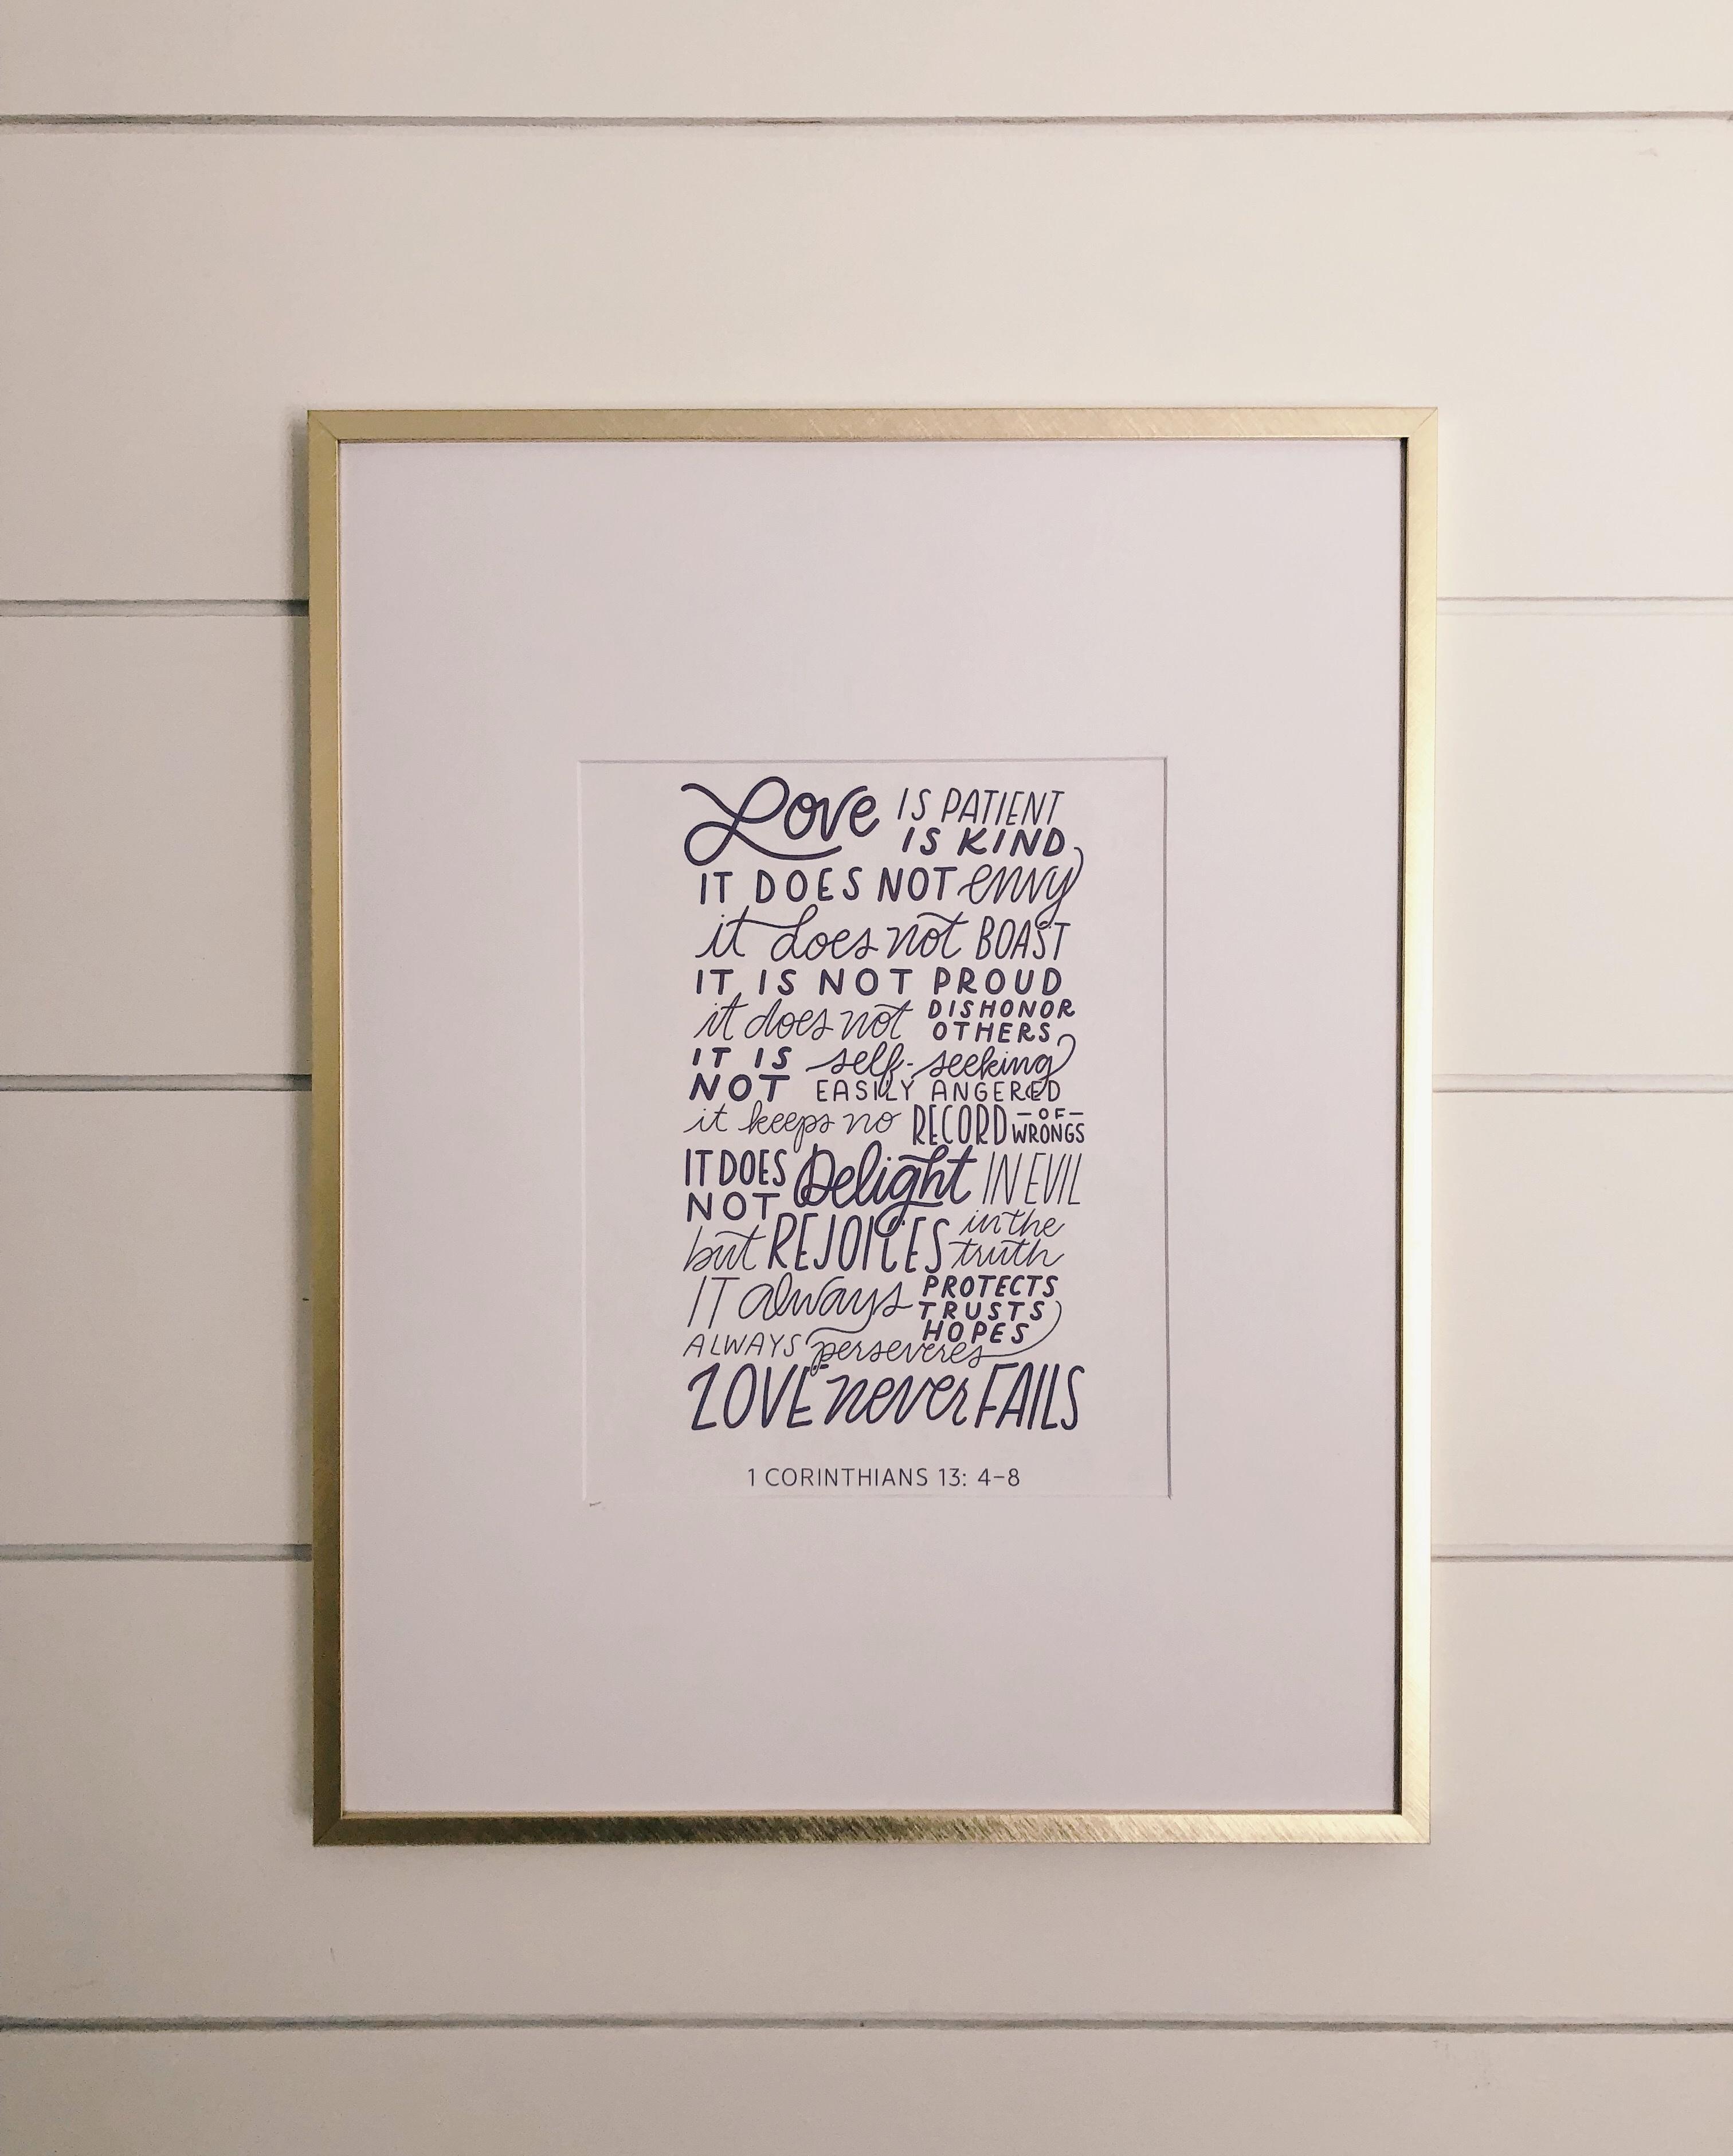 Love Is Patient, Love Is Kind   Free Printable   Harbor + Pine - Love Is Patient Love Is Kind Free Printable